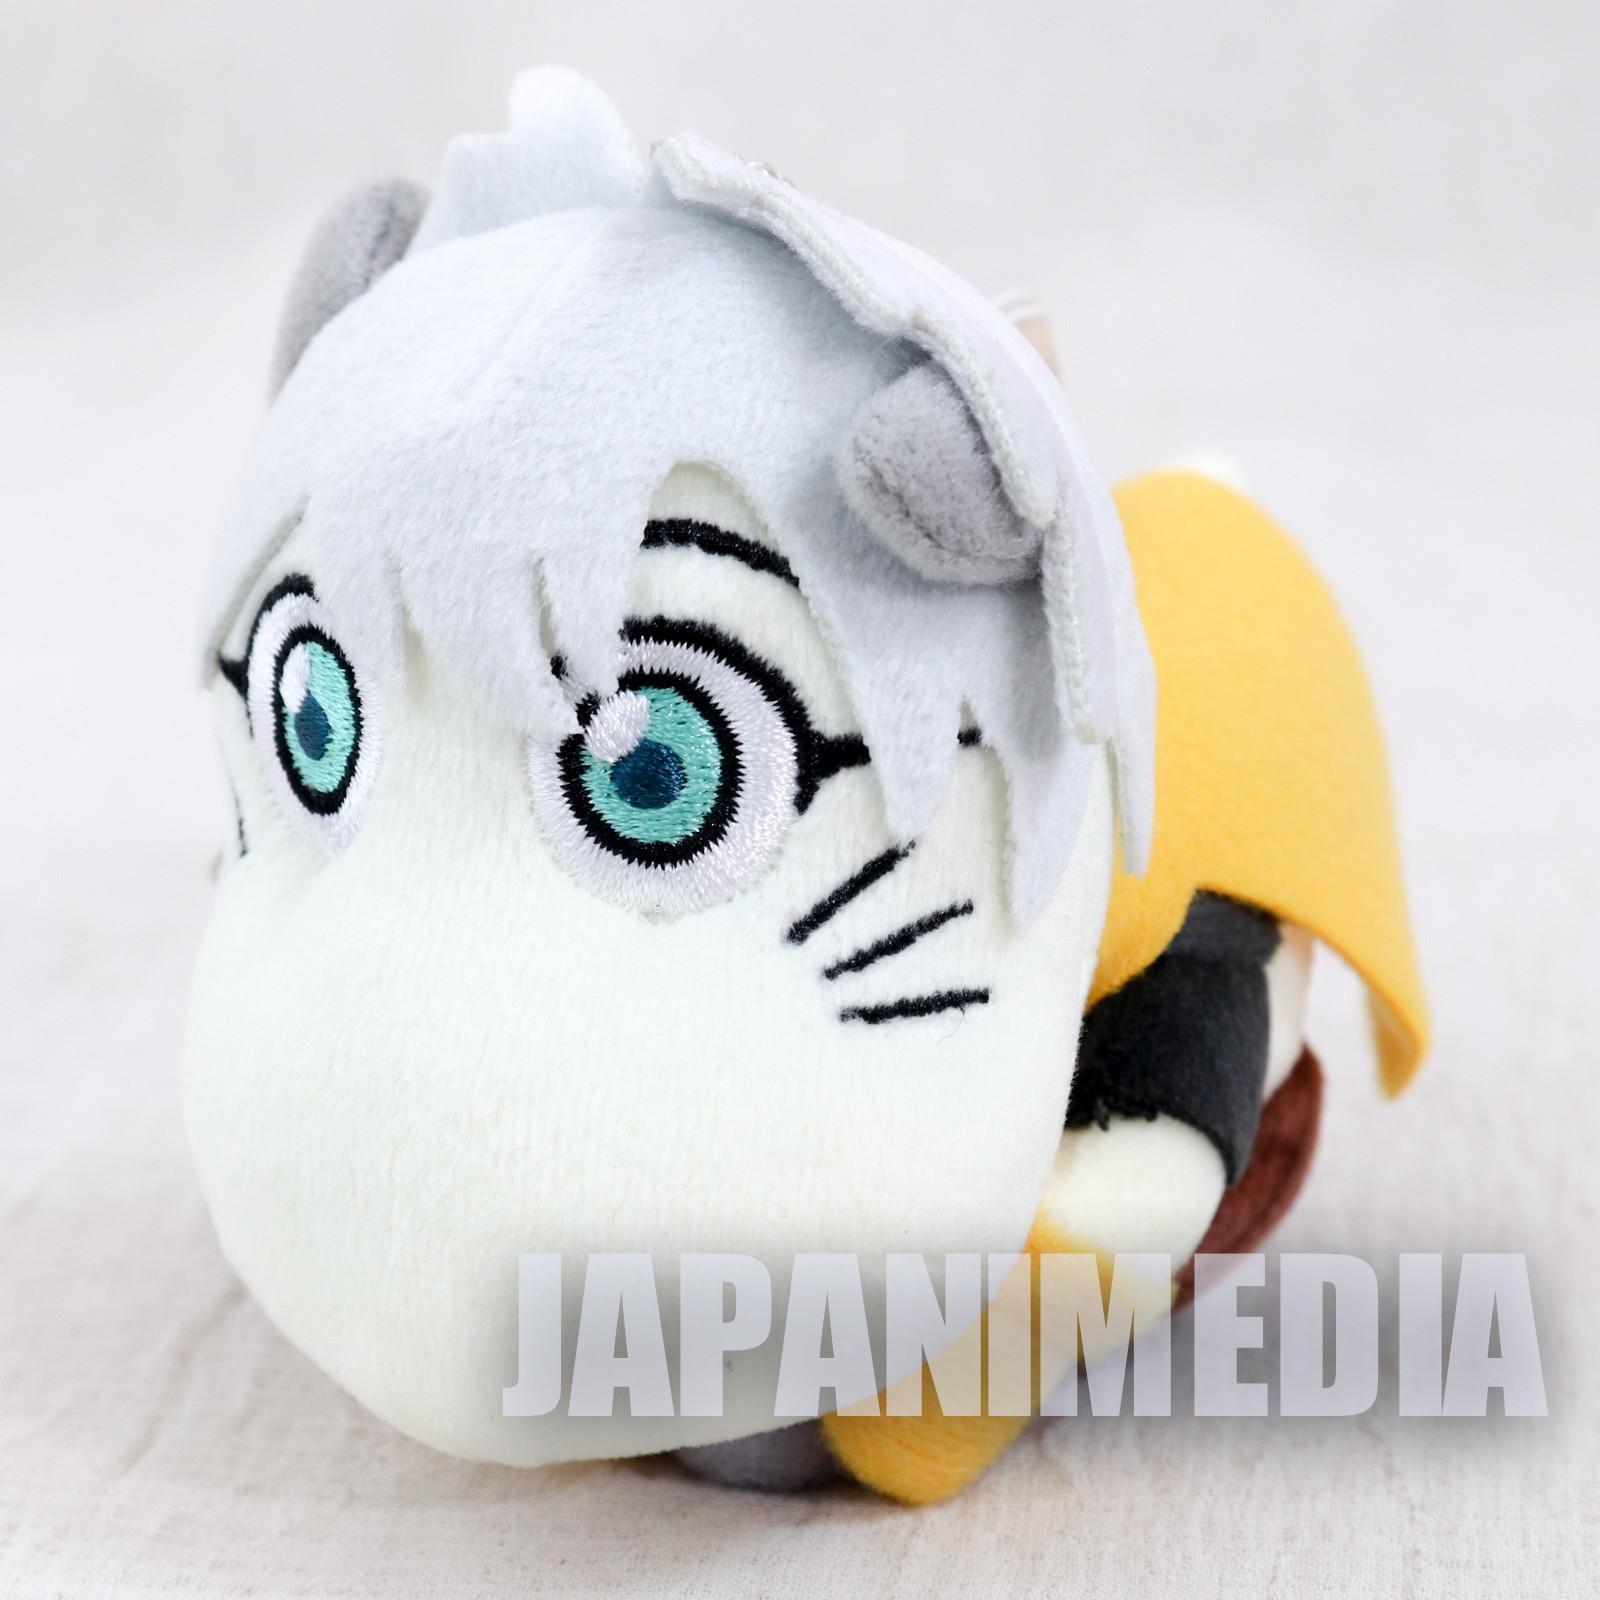 Senkaiden Hoshin Engi Sibuxiang Plush Doll Ballchain Shonen Jump Exhibition